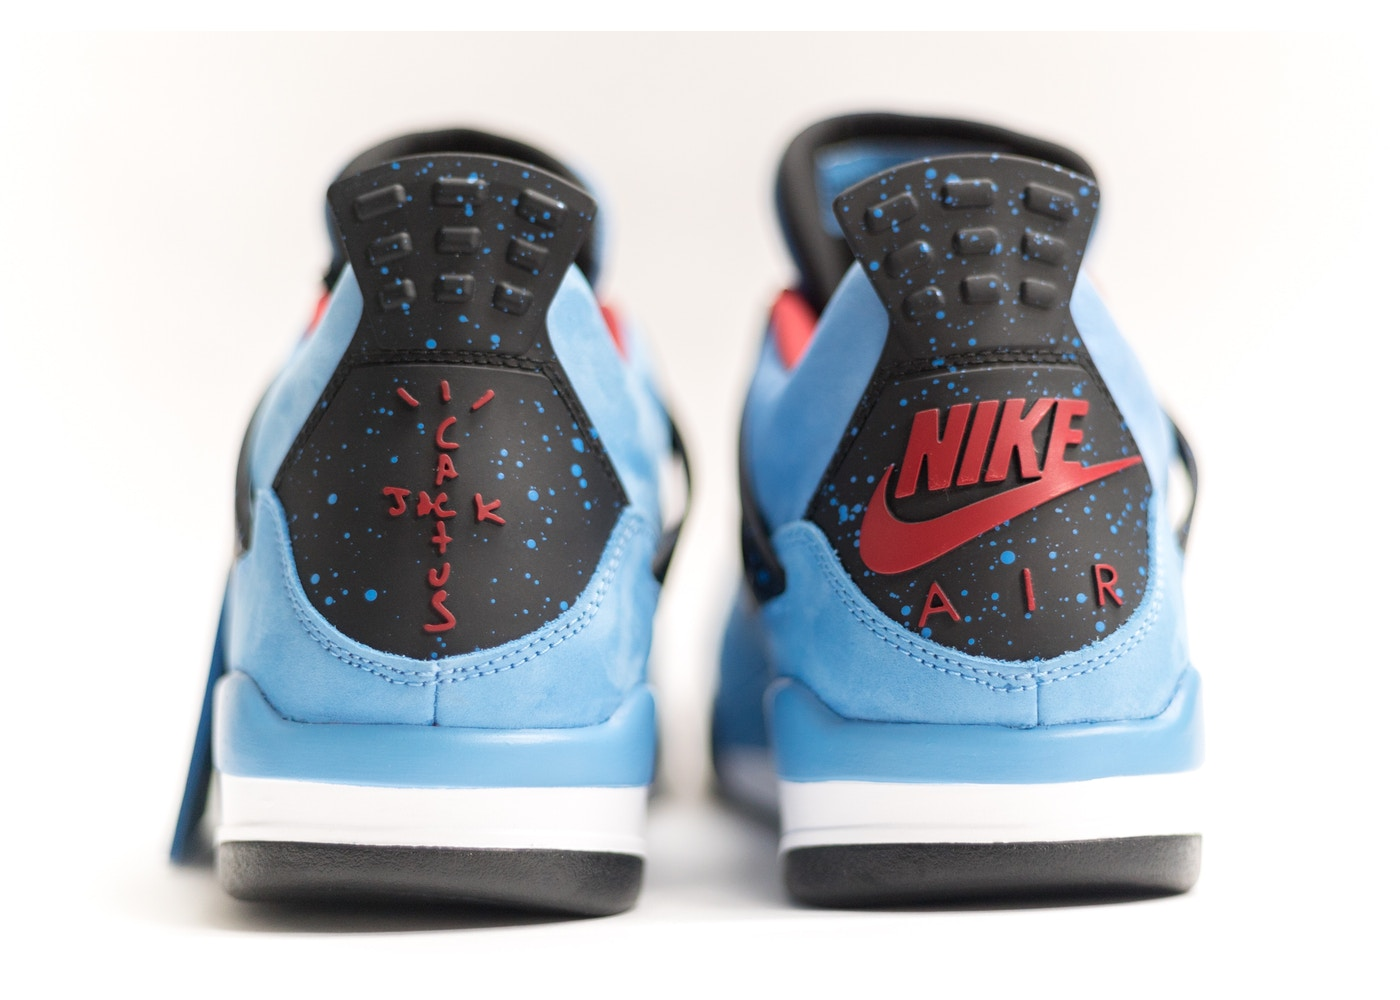 buy popular 786b9 13ce5 Air Jordan 4 Size 17 Shoes - Release Date